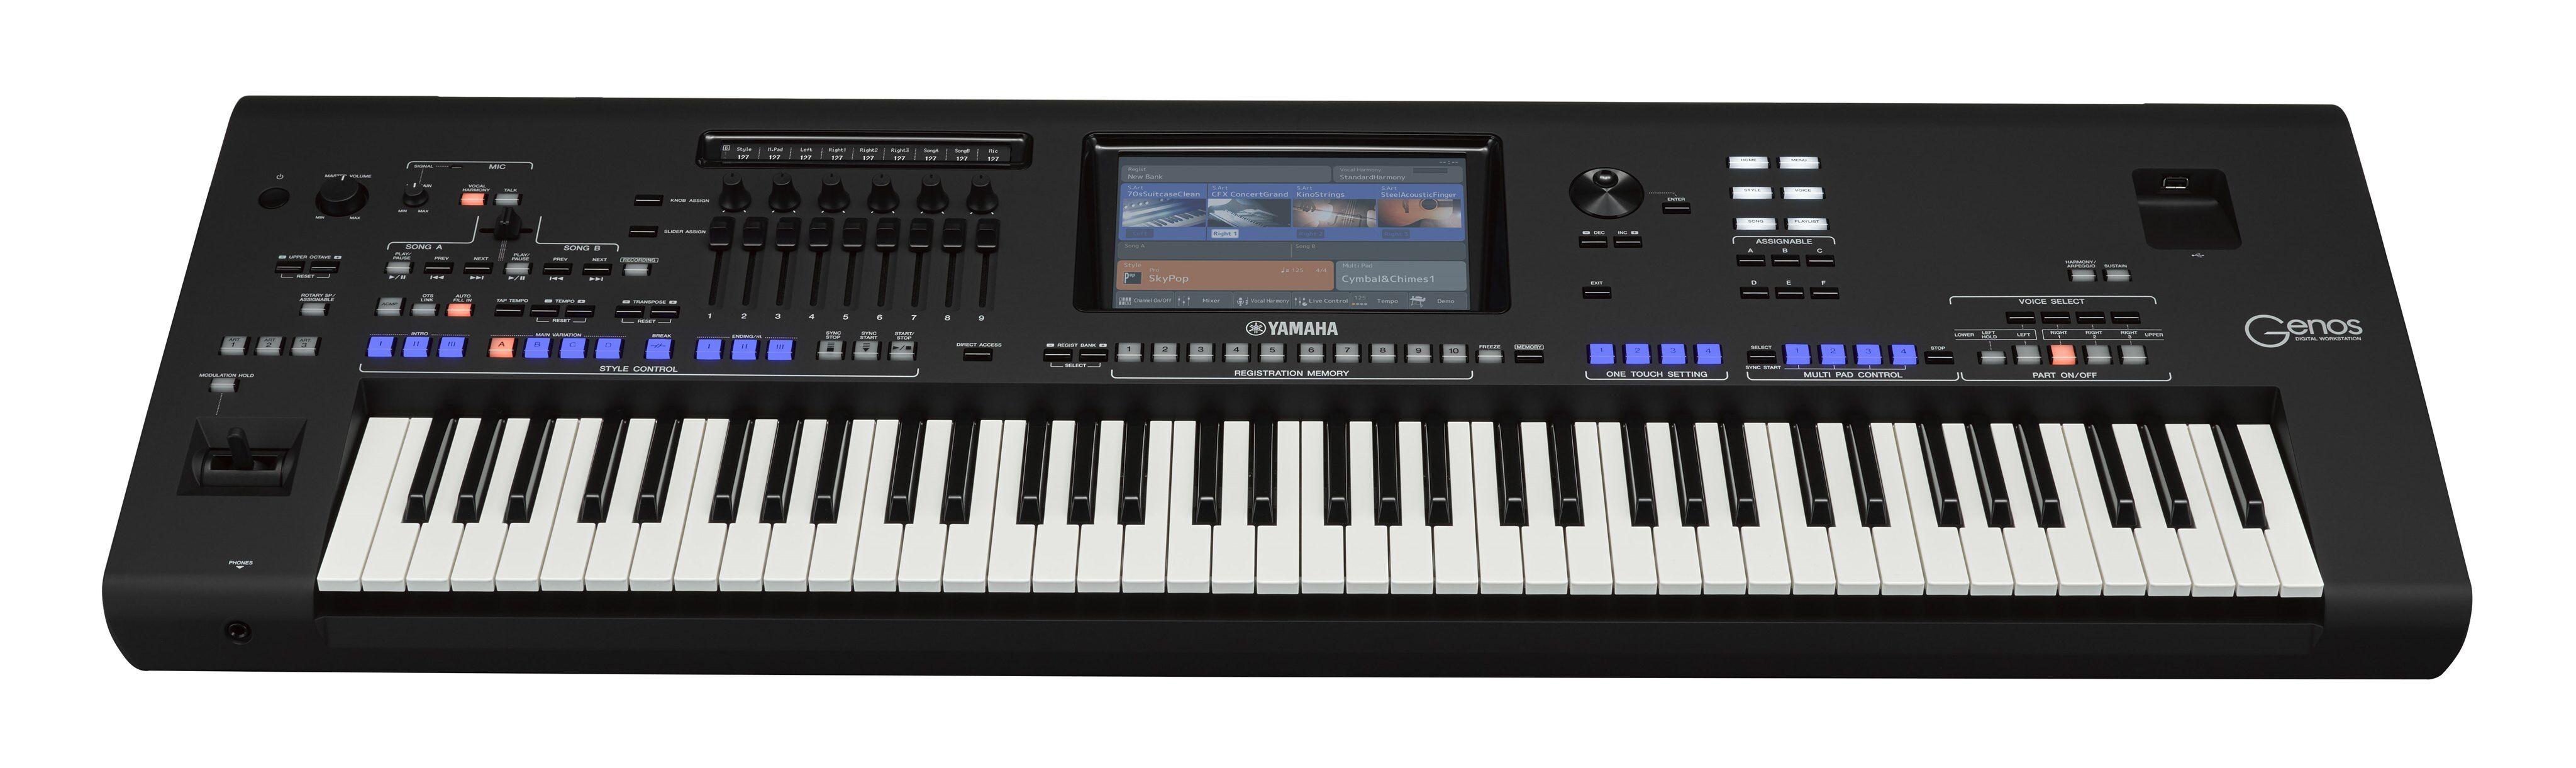 Yamaha Genos 76 Workstation